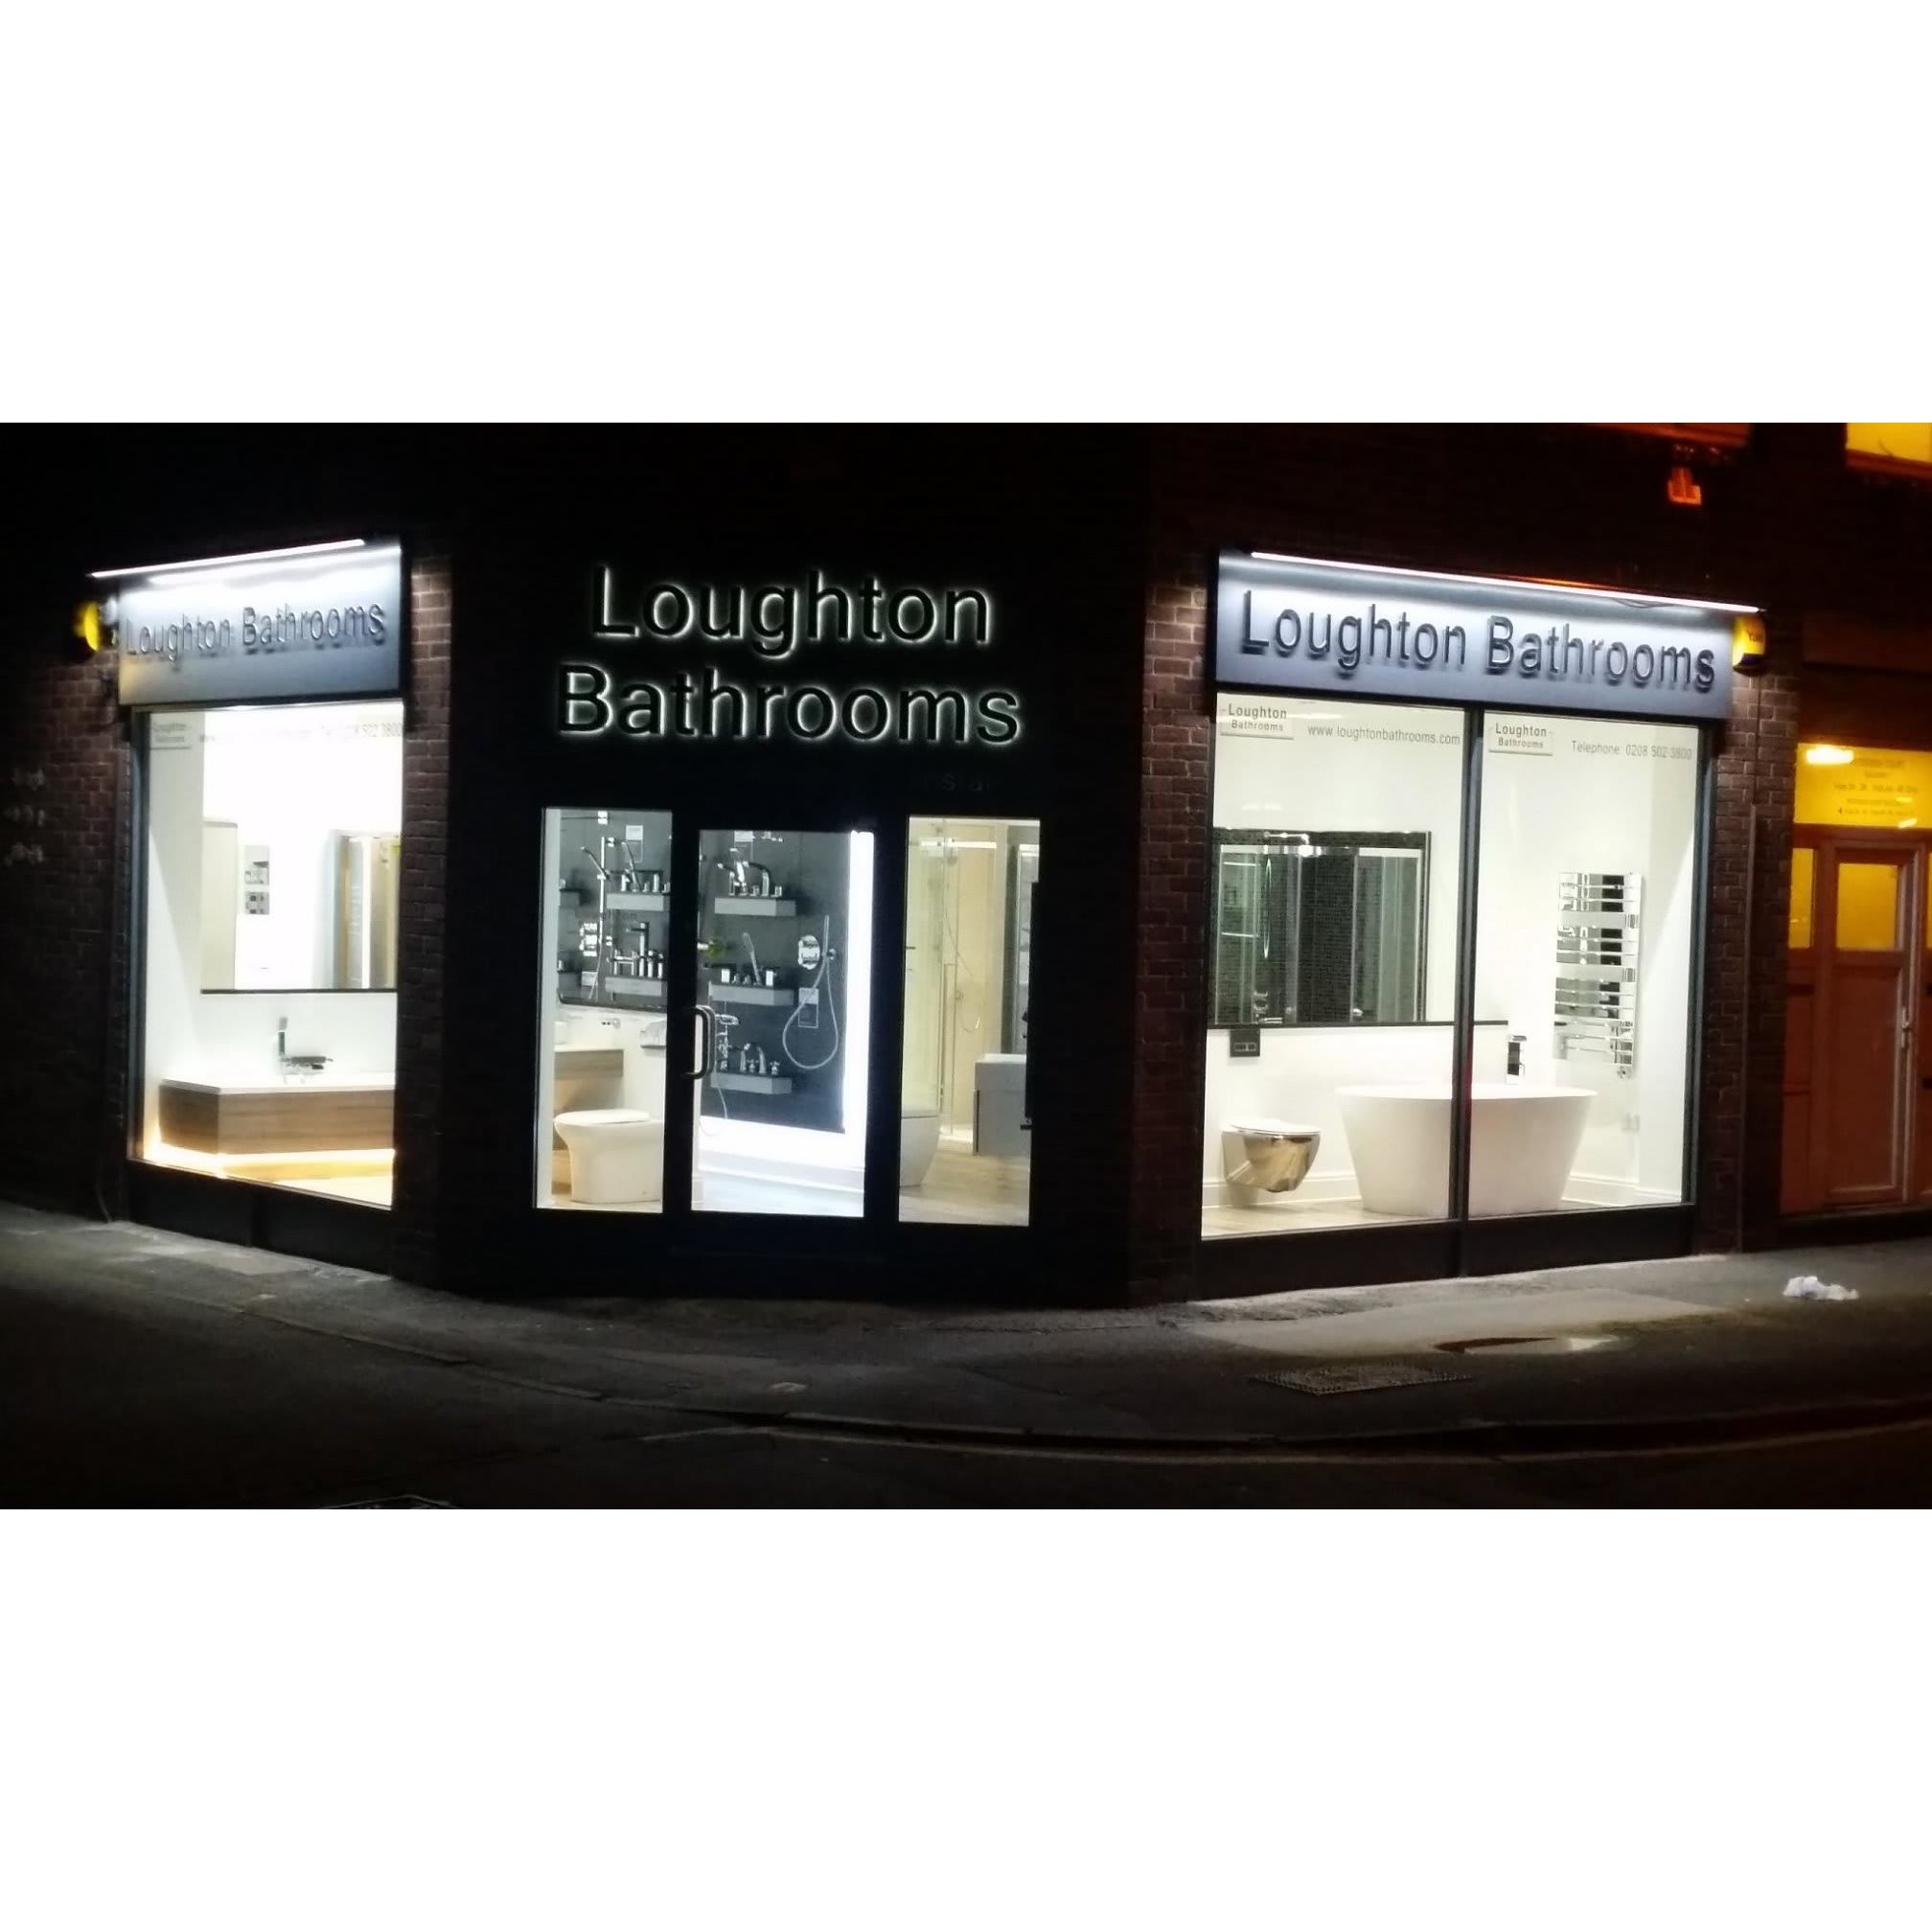 Loughton Bathrooms - Loughton, Essex IG10 2RS - 020 8502 3800 | ShowMeLocal.com